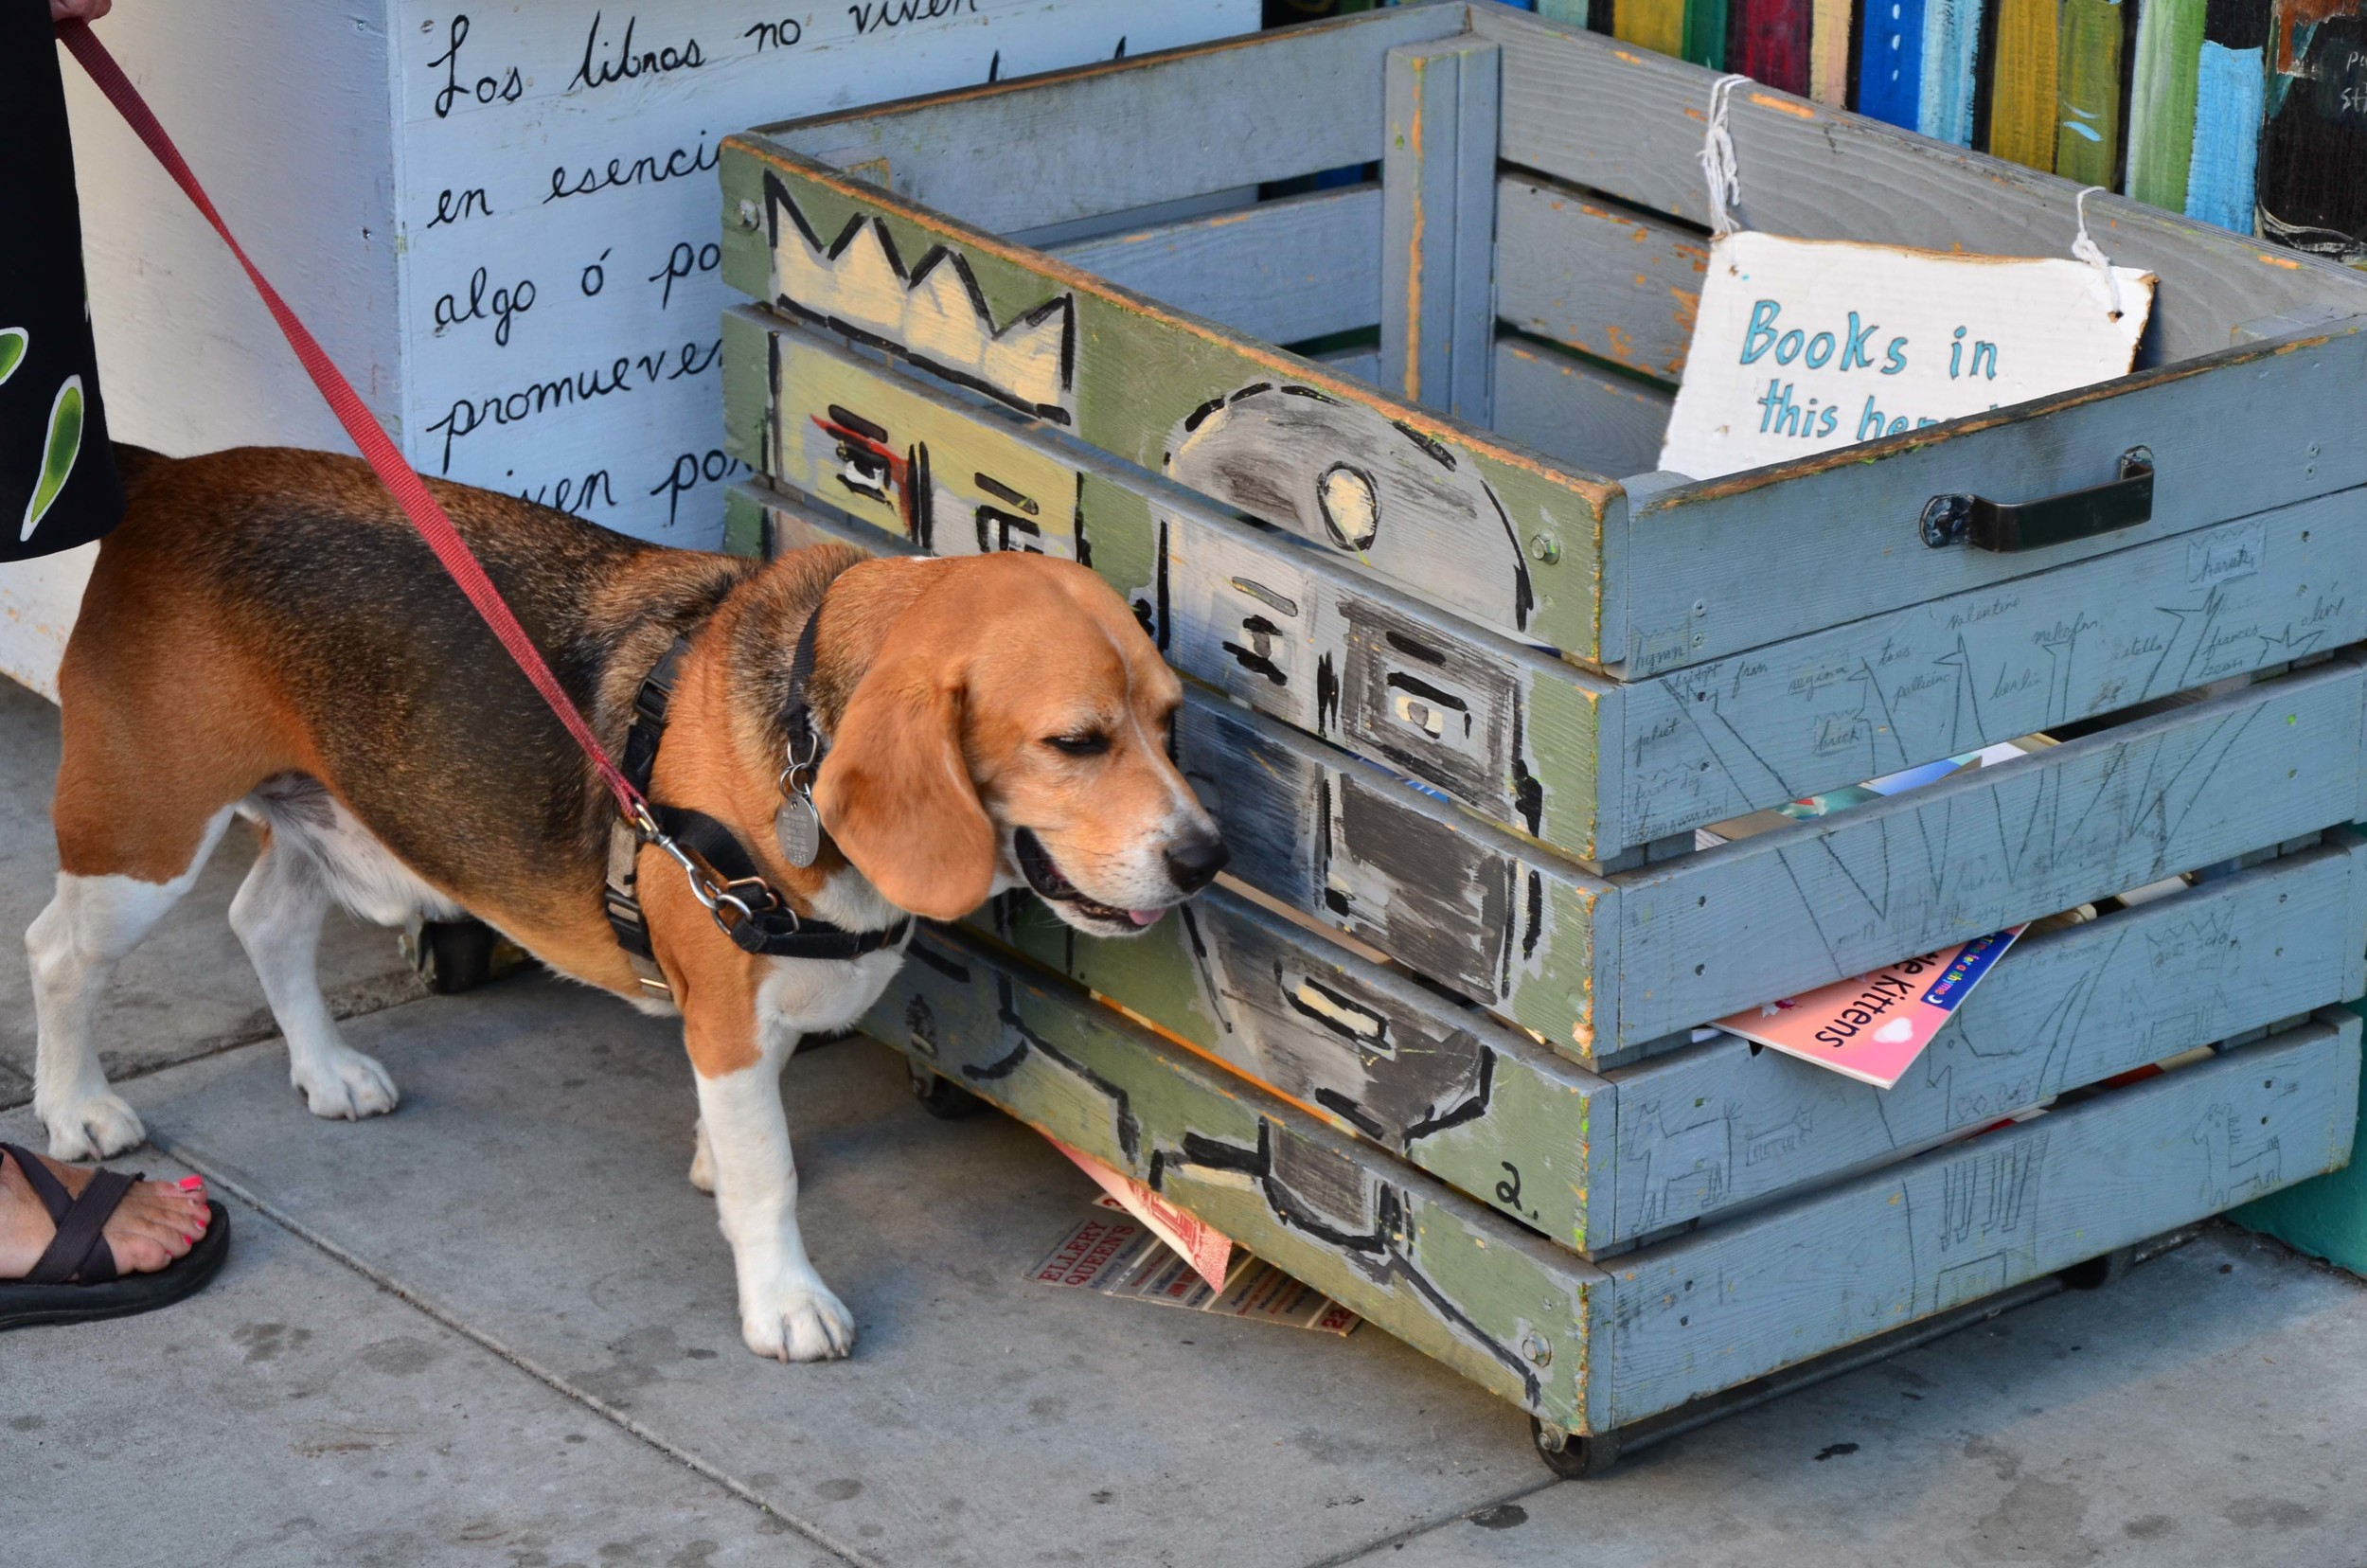 Free Books Bin at Dog Eared Books